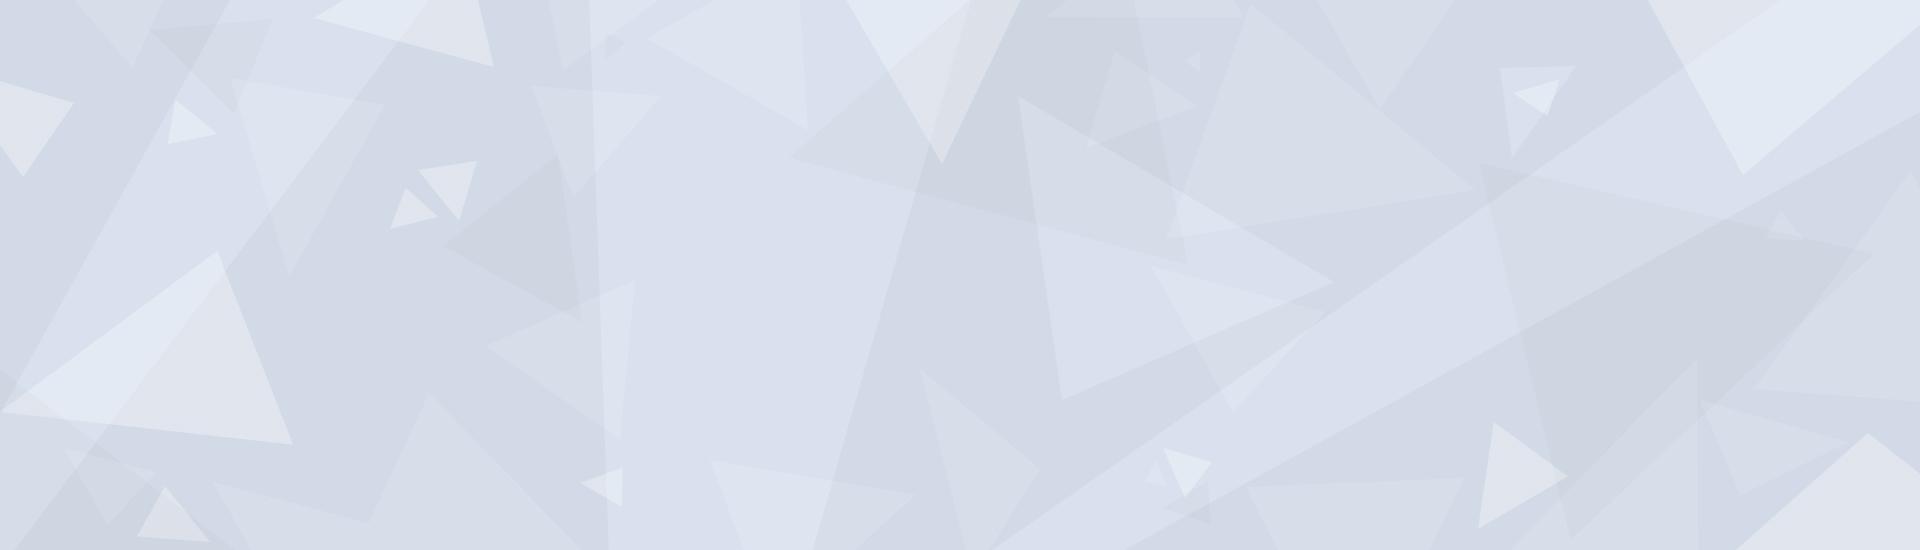 MigattoNoCalla - VSLeague Online eSport